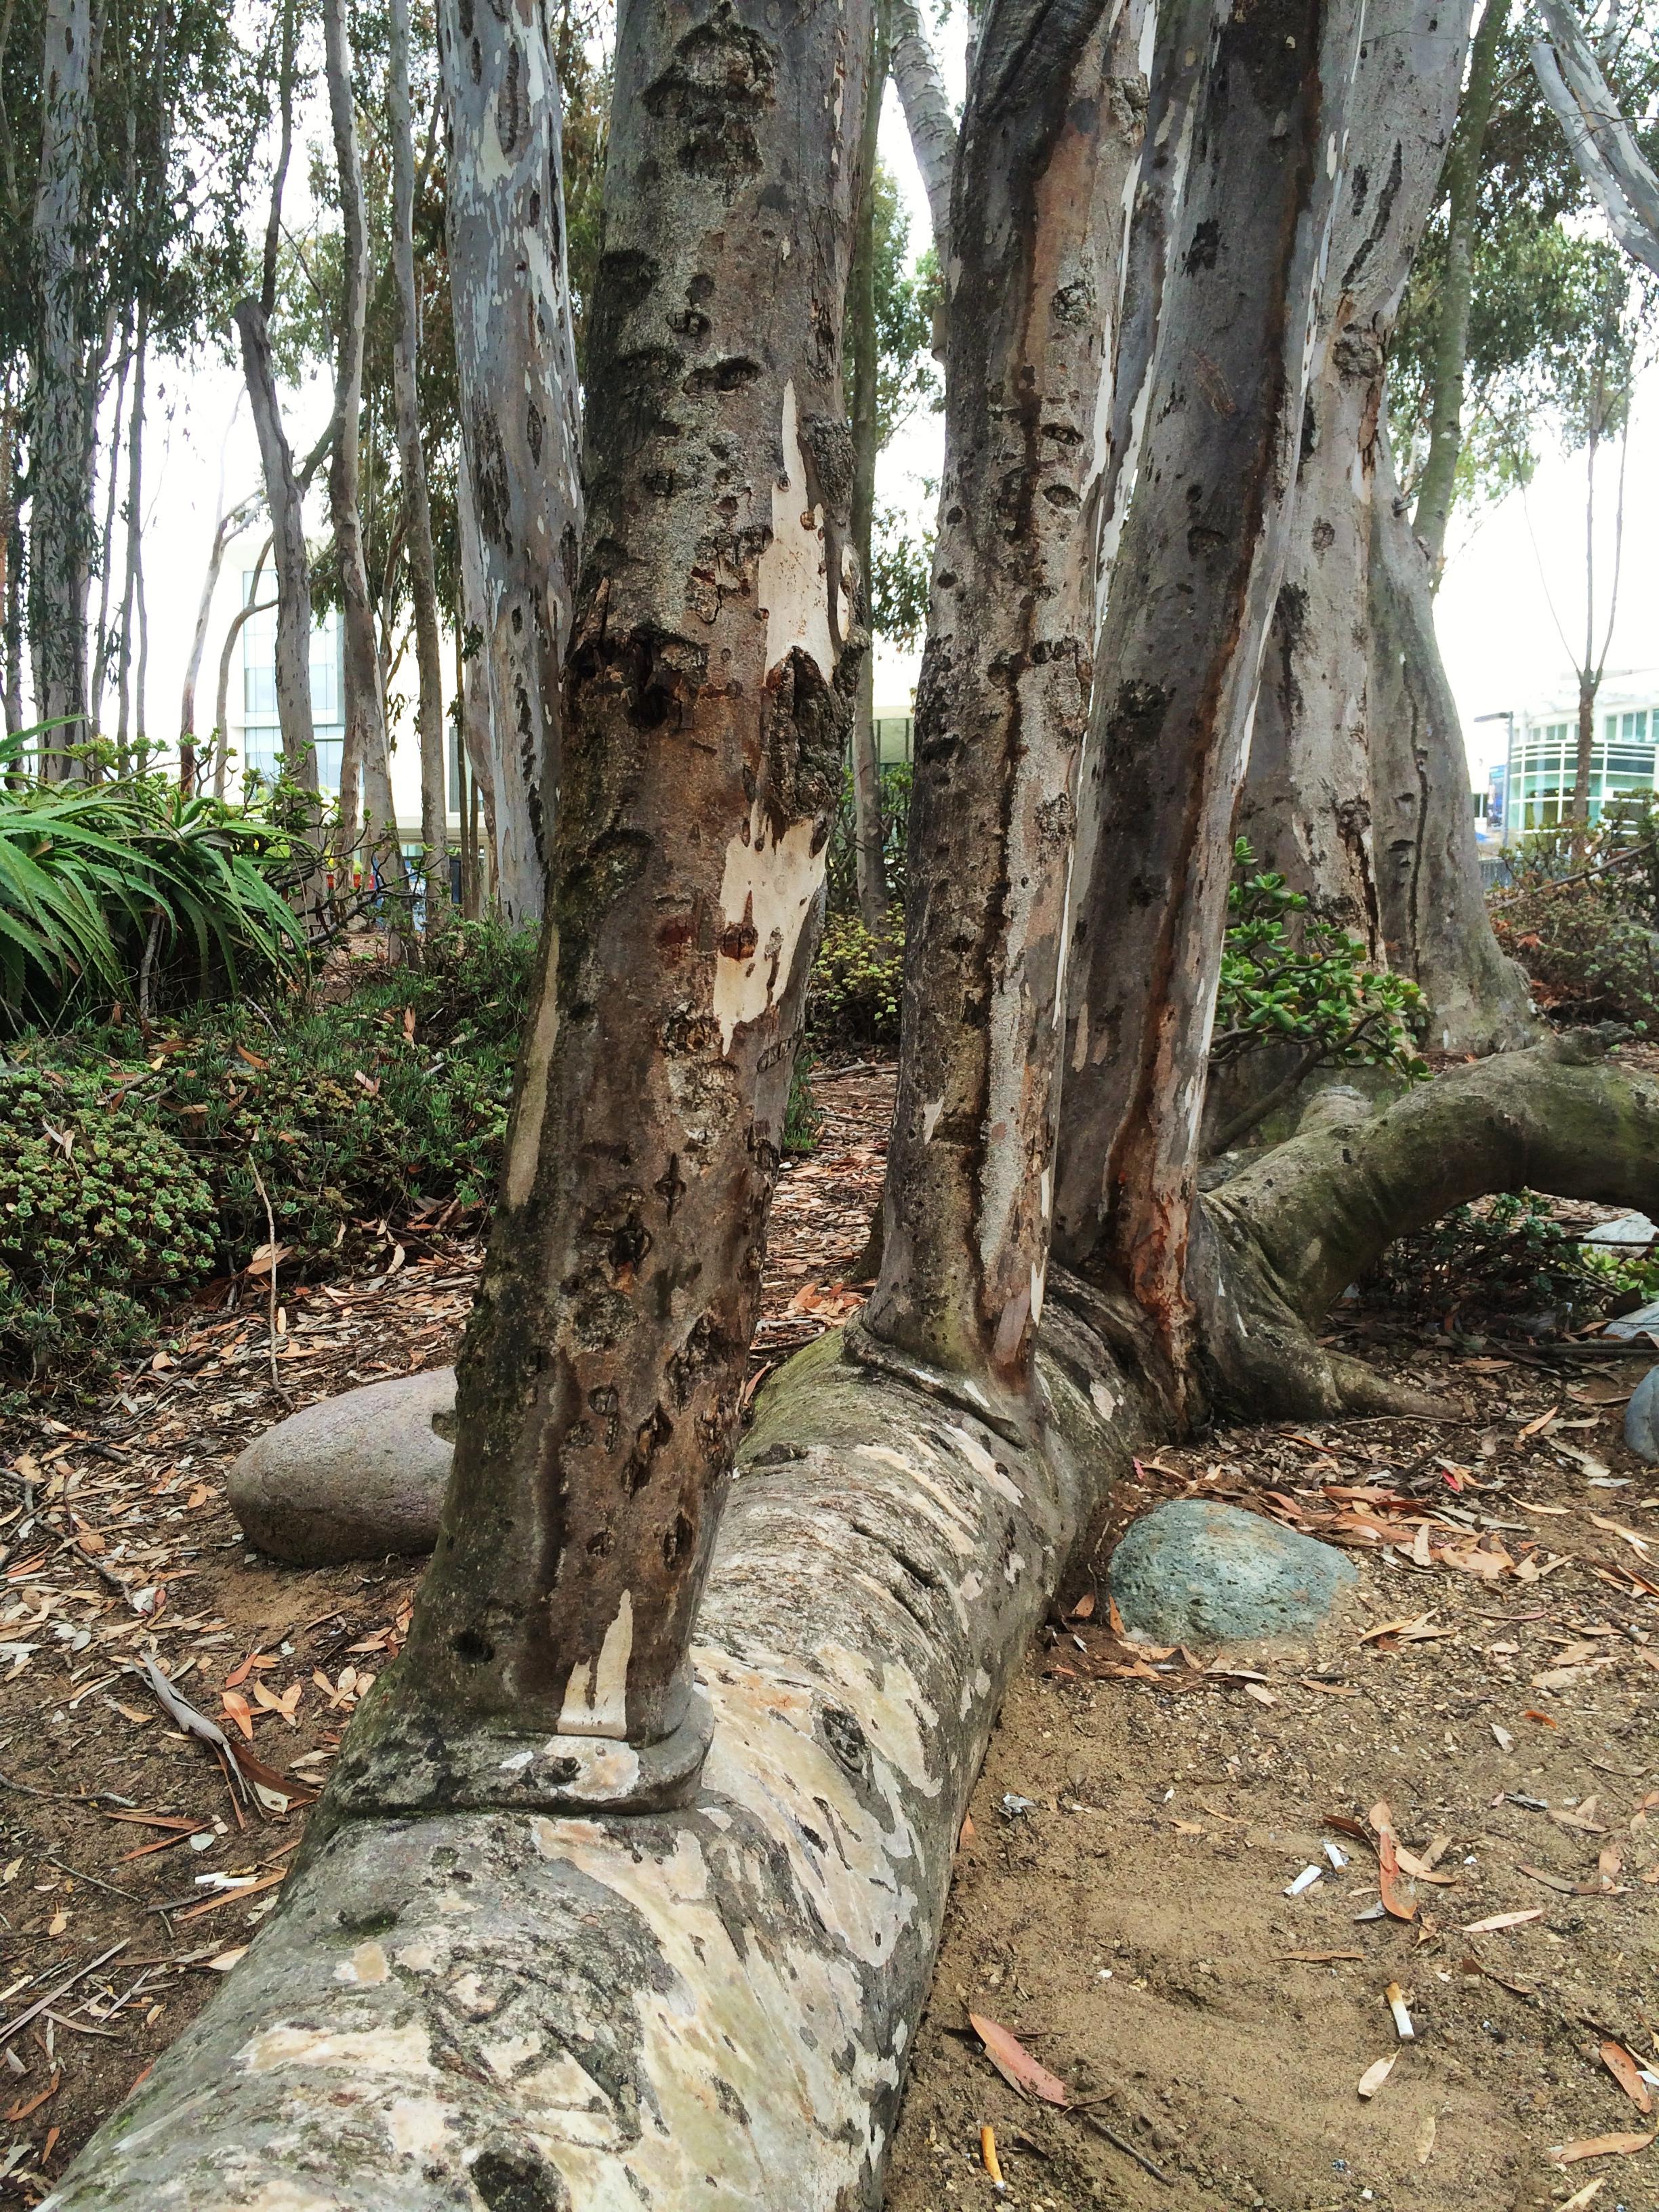 eucalyptus growing from a stump